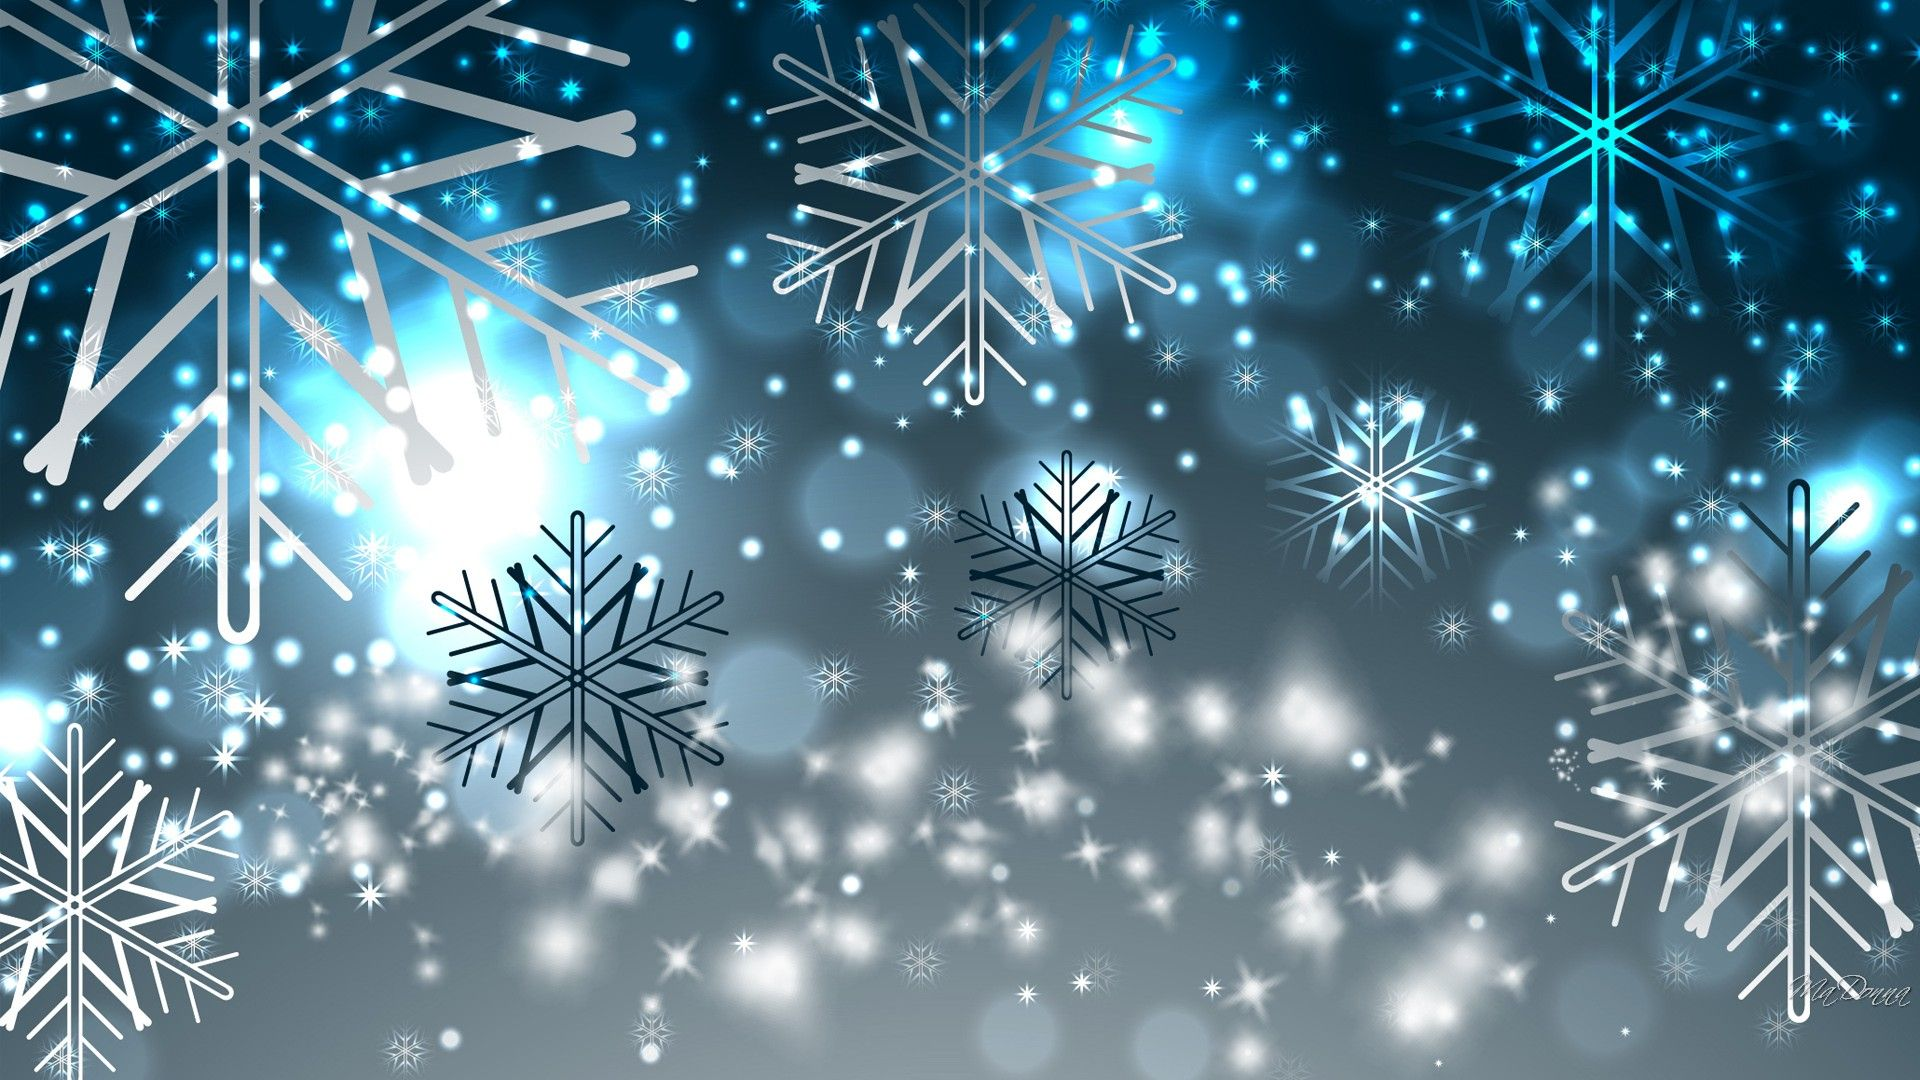 Windows Desktop Backgrounds For Christmas Best Hd Desktop Wallpapers 1080p Hd Wallpapers Winter Blues Wallpaper Christmas Background